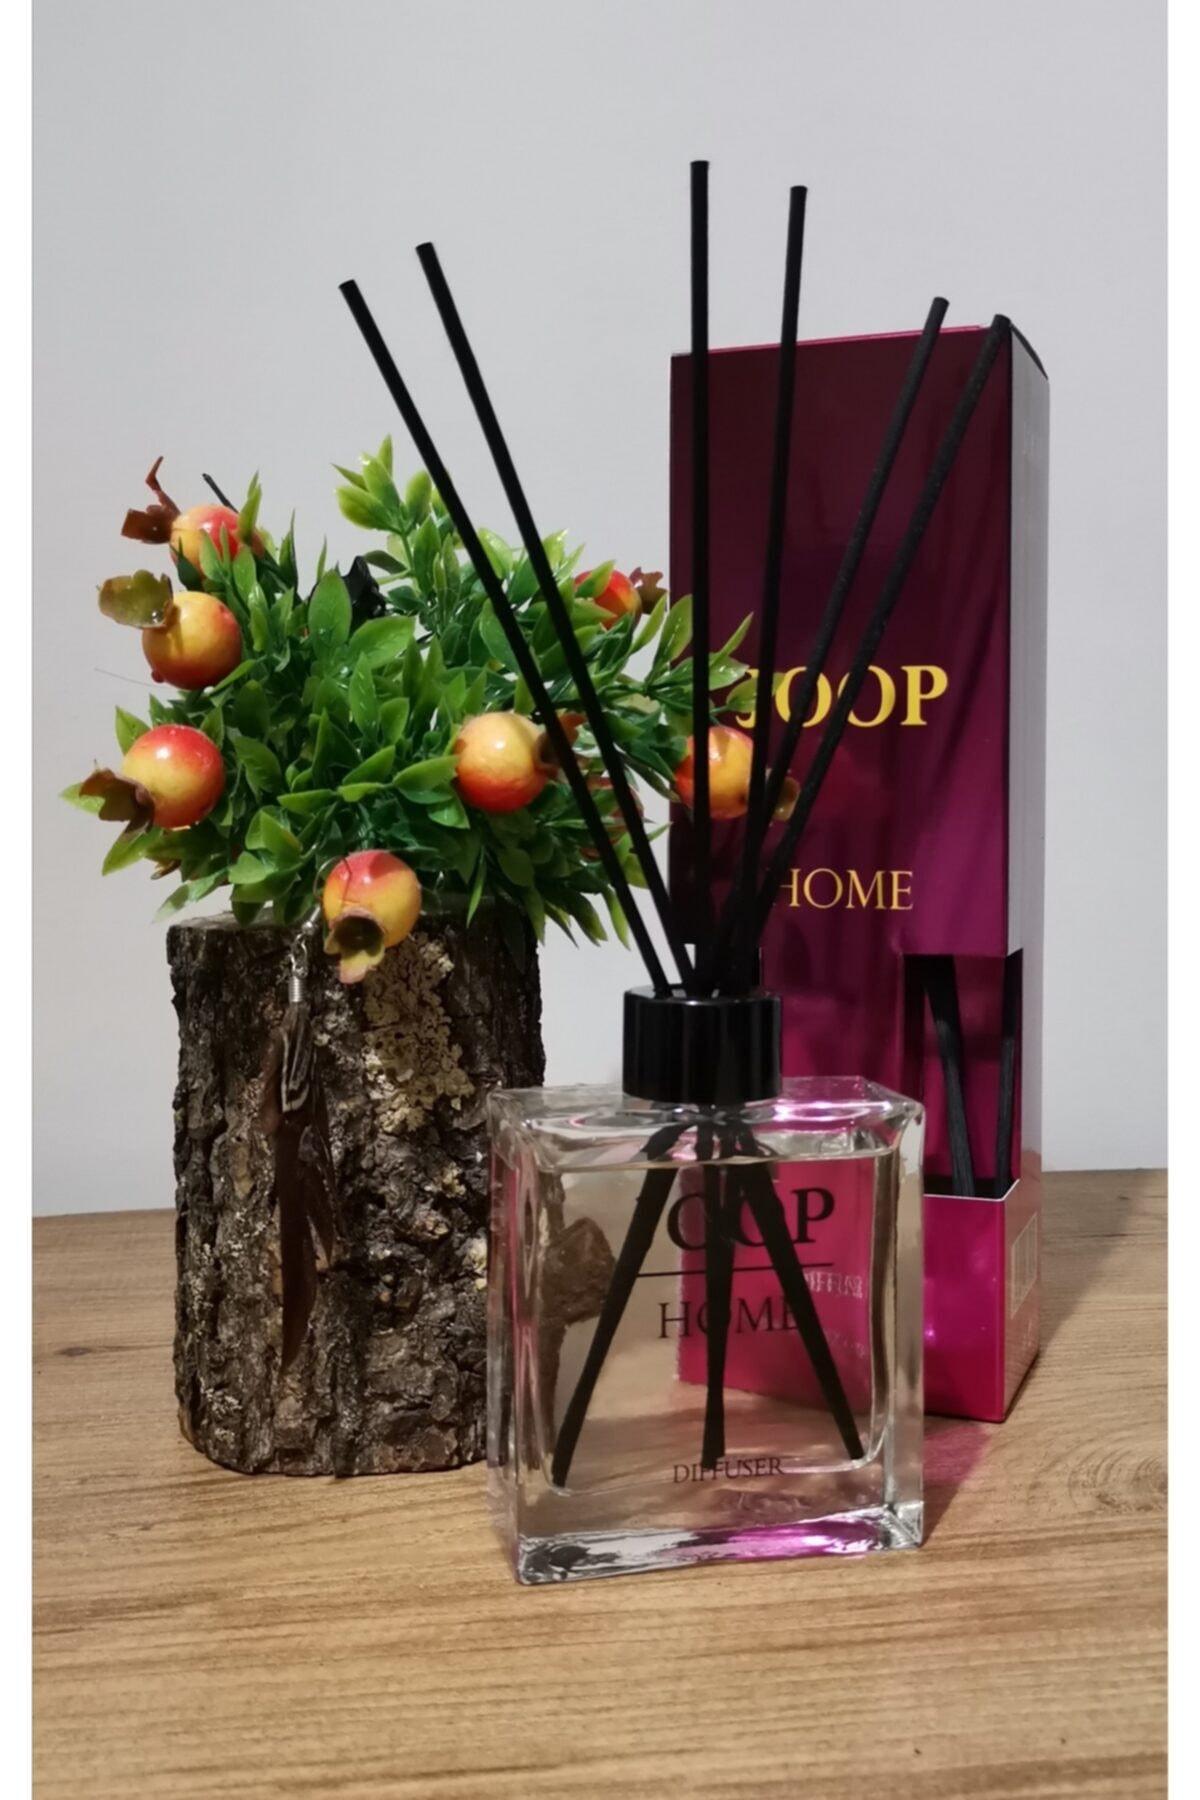 Joop Home Red Bambu Çubuklu Oda Kokusu 100 ml New Seri 1